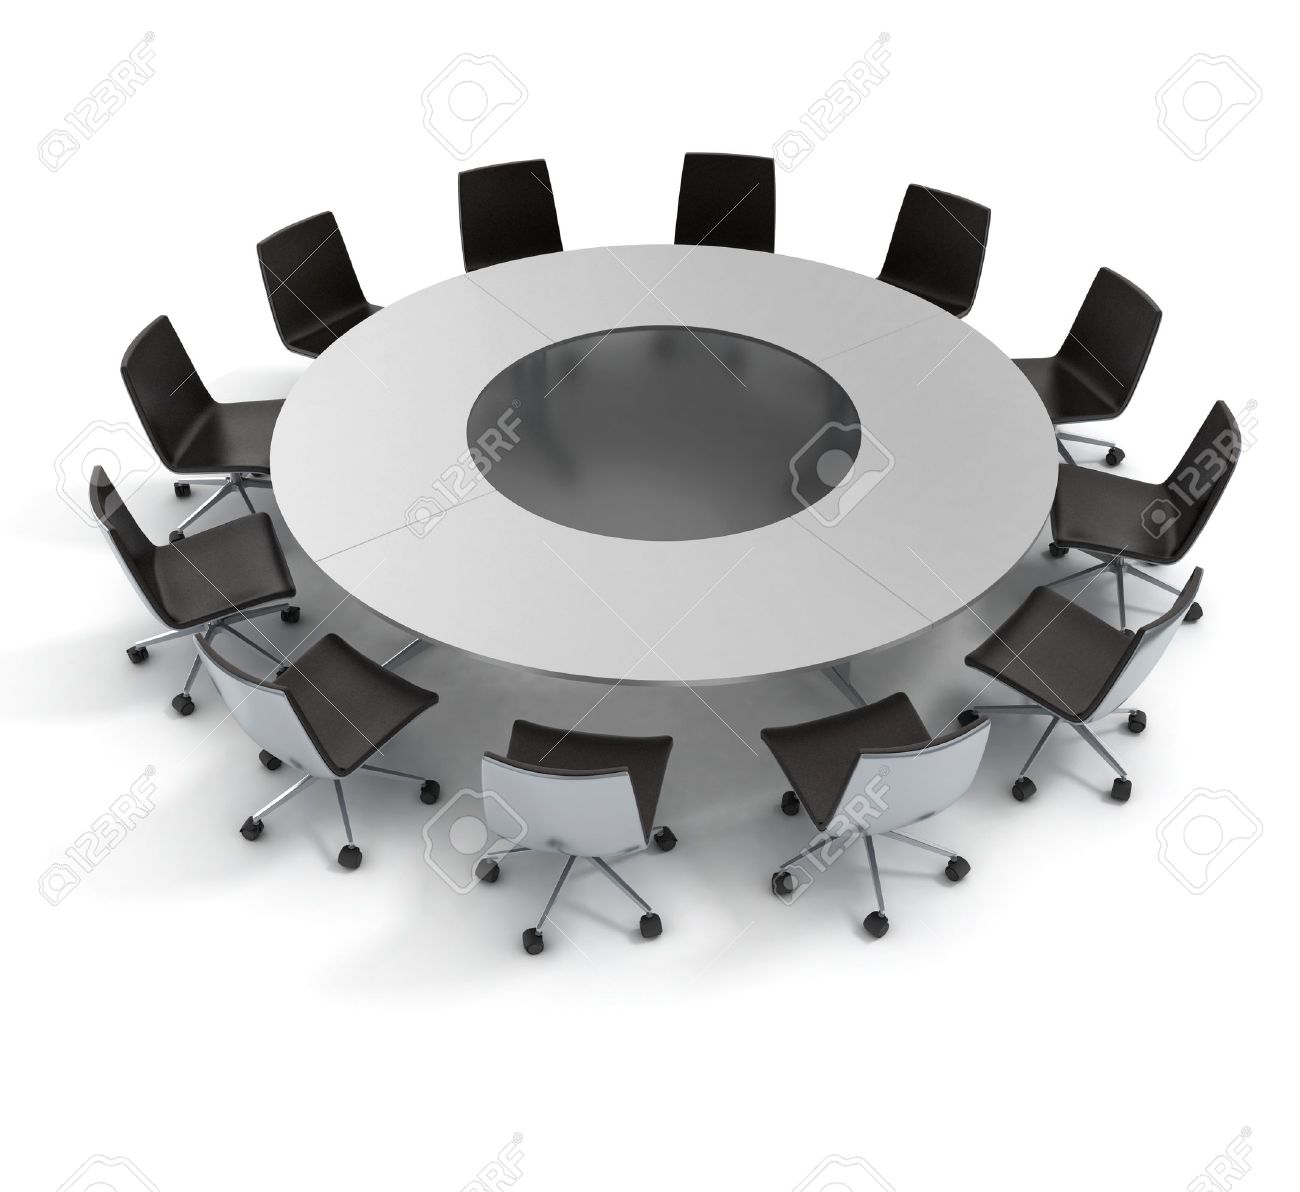 Round table meeting icon - Round Table Meeting Icon Conference Table Round Table Diplomacy Conference Meeting 3d Concept Stock Photo